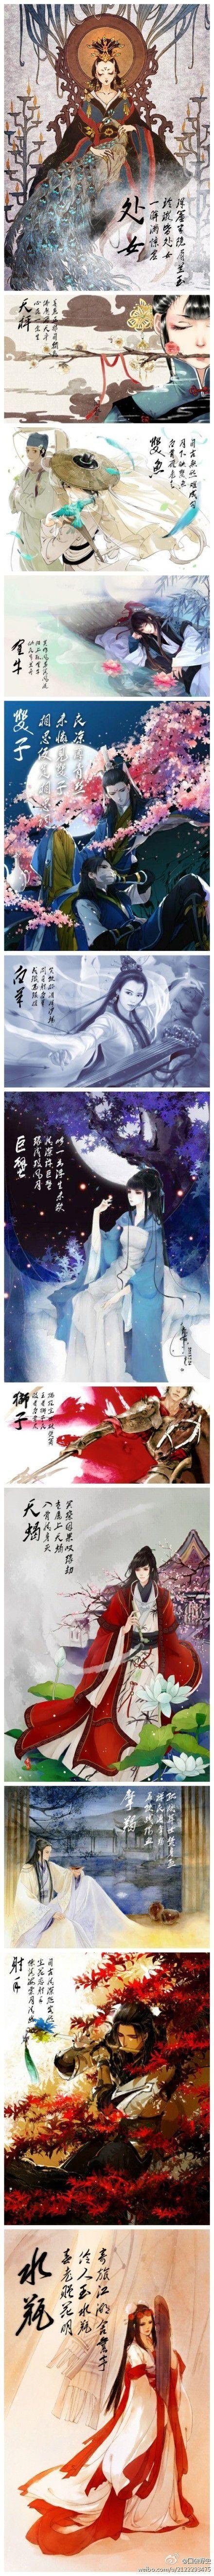 古风 十二星座 zodiac in traditional Chinese style